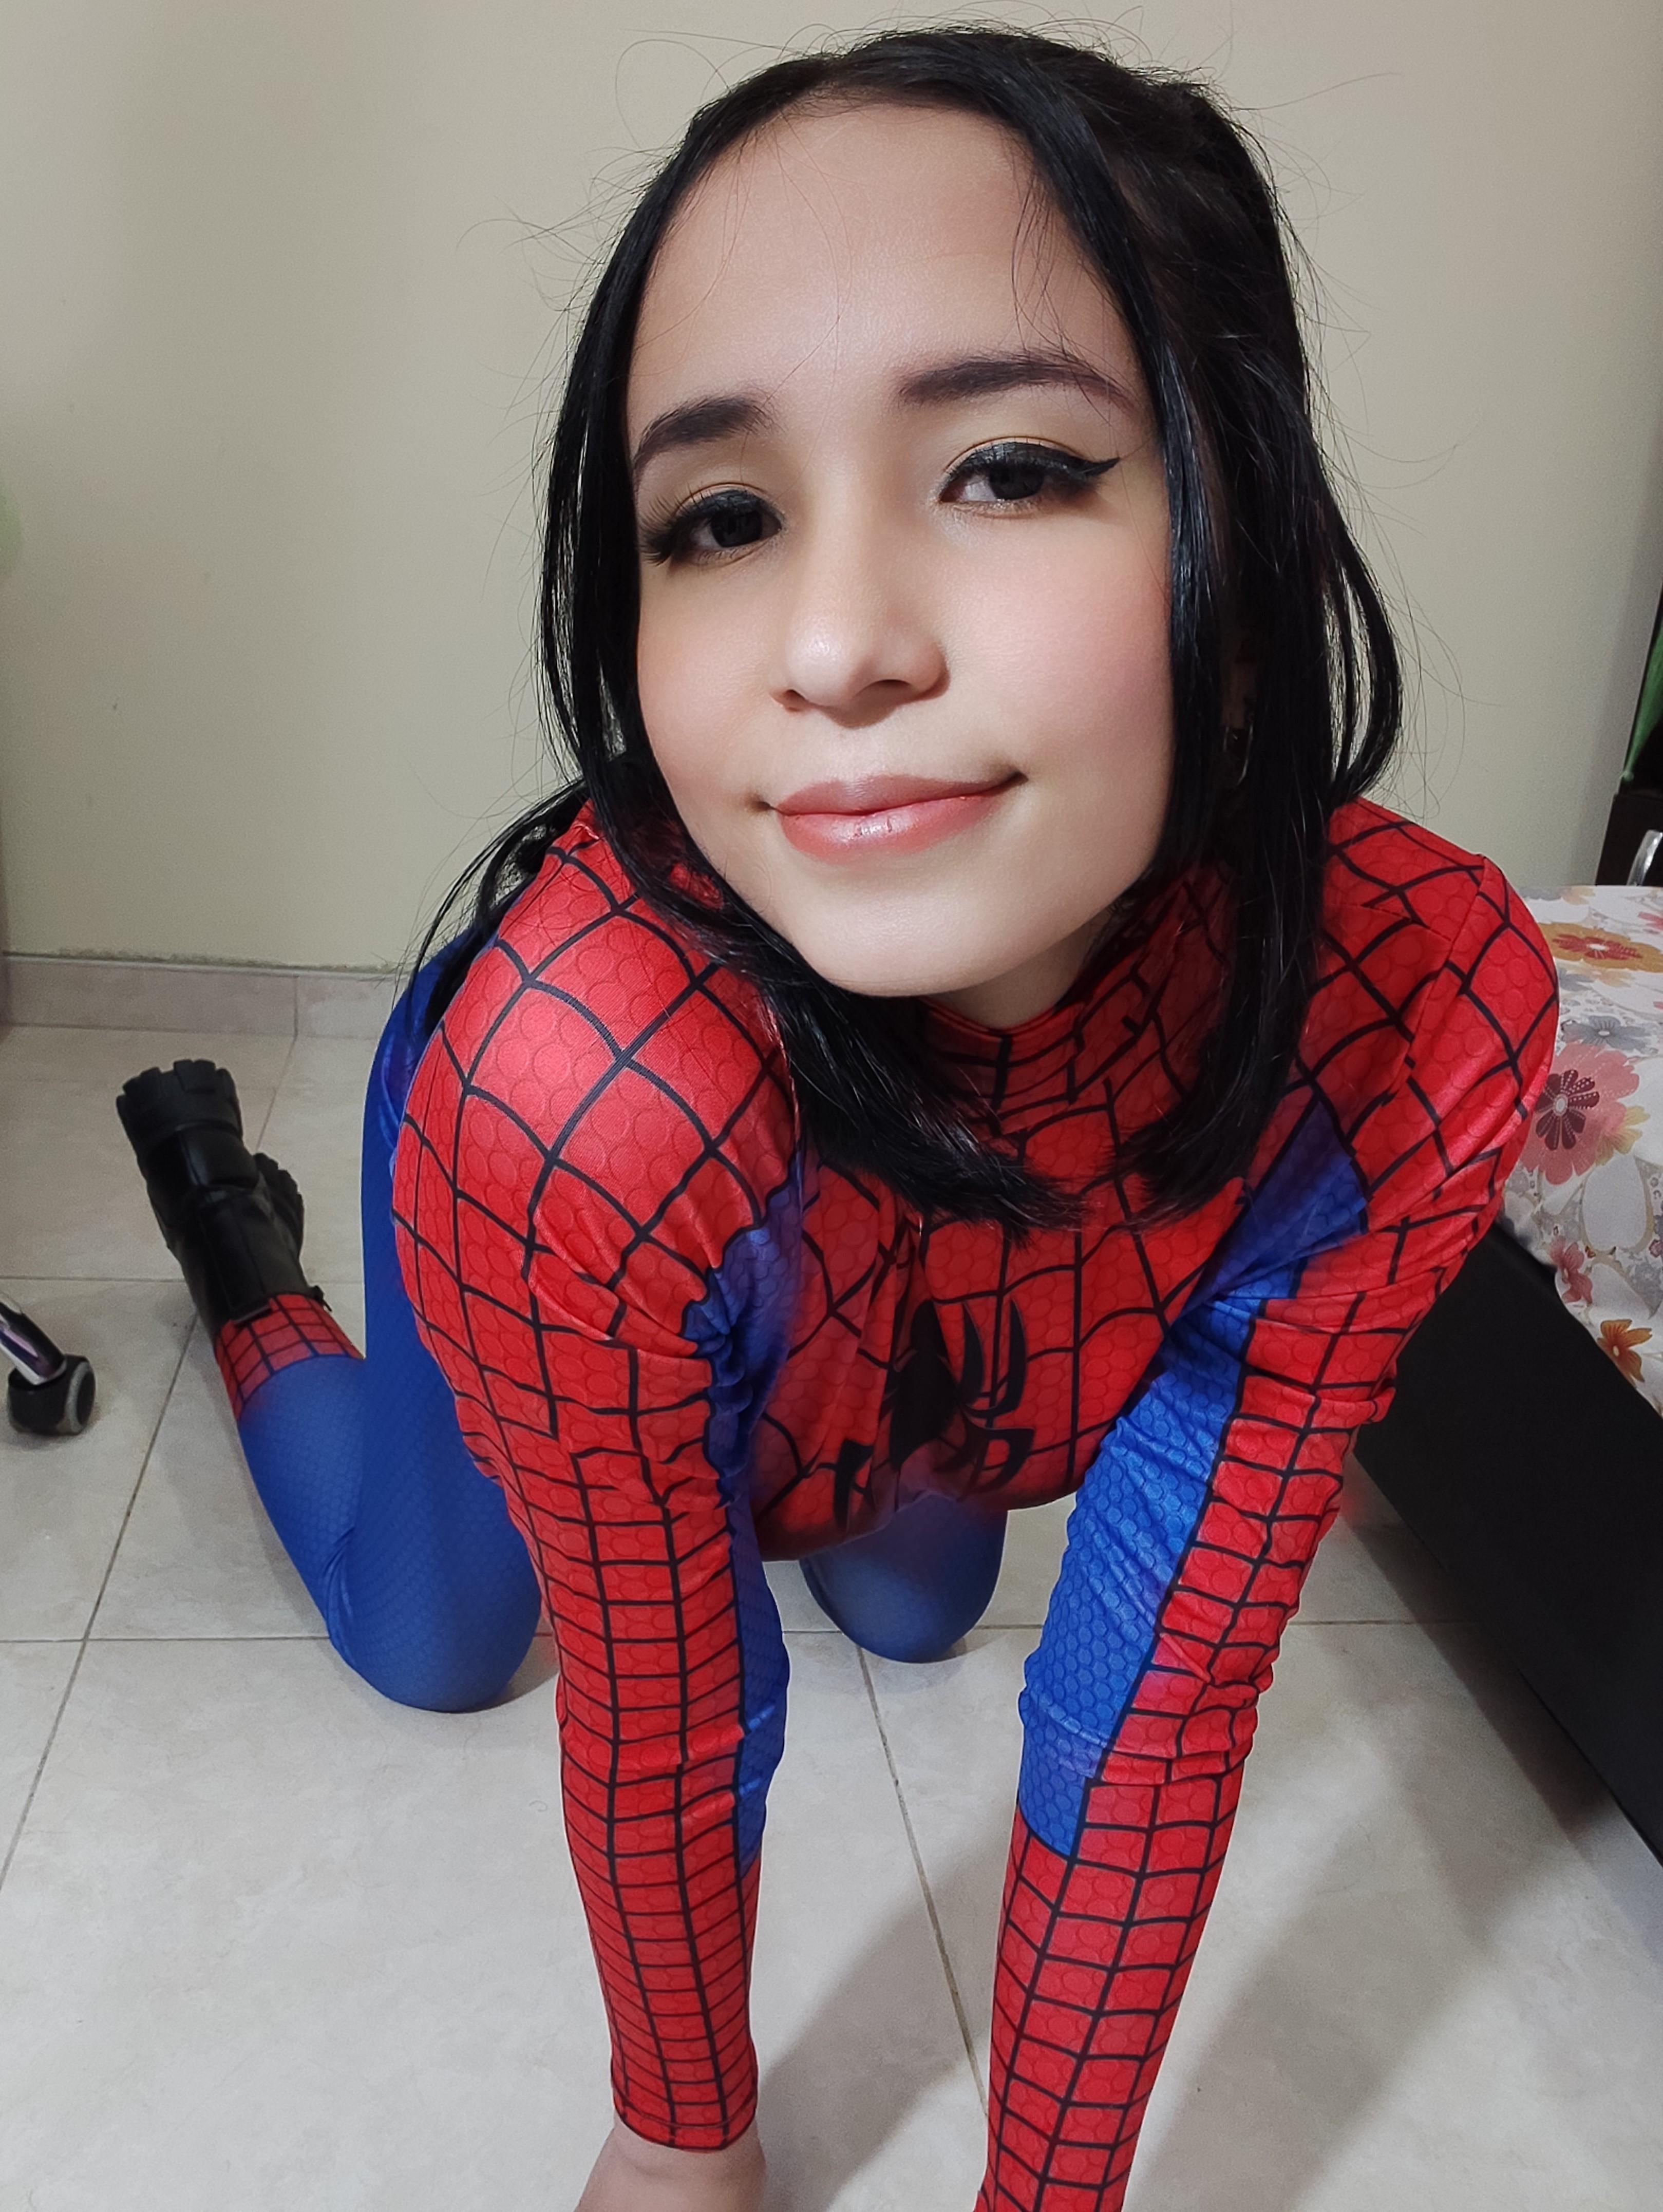 Chica kawaii?s=hyzmbu6mlipqsgddk0bxmqcc2qawoltzi5jquh9757k=